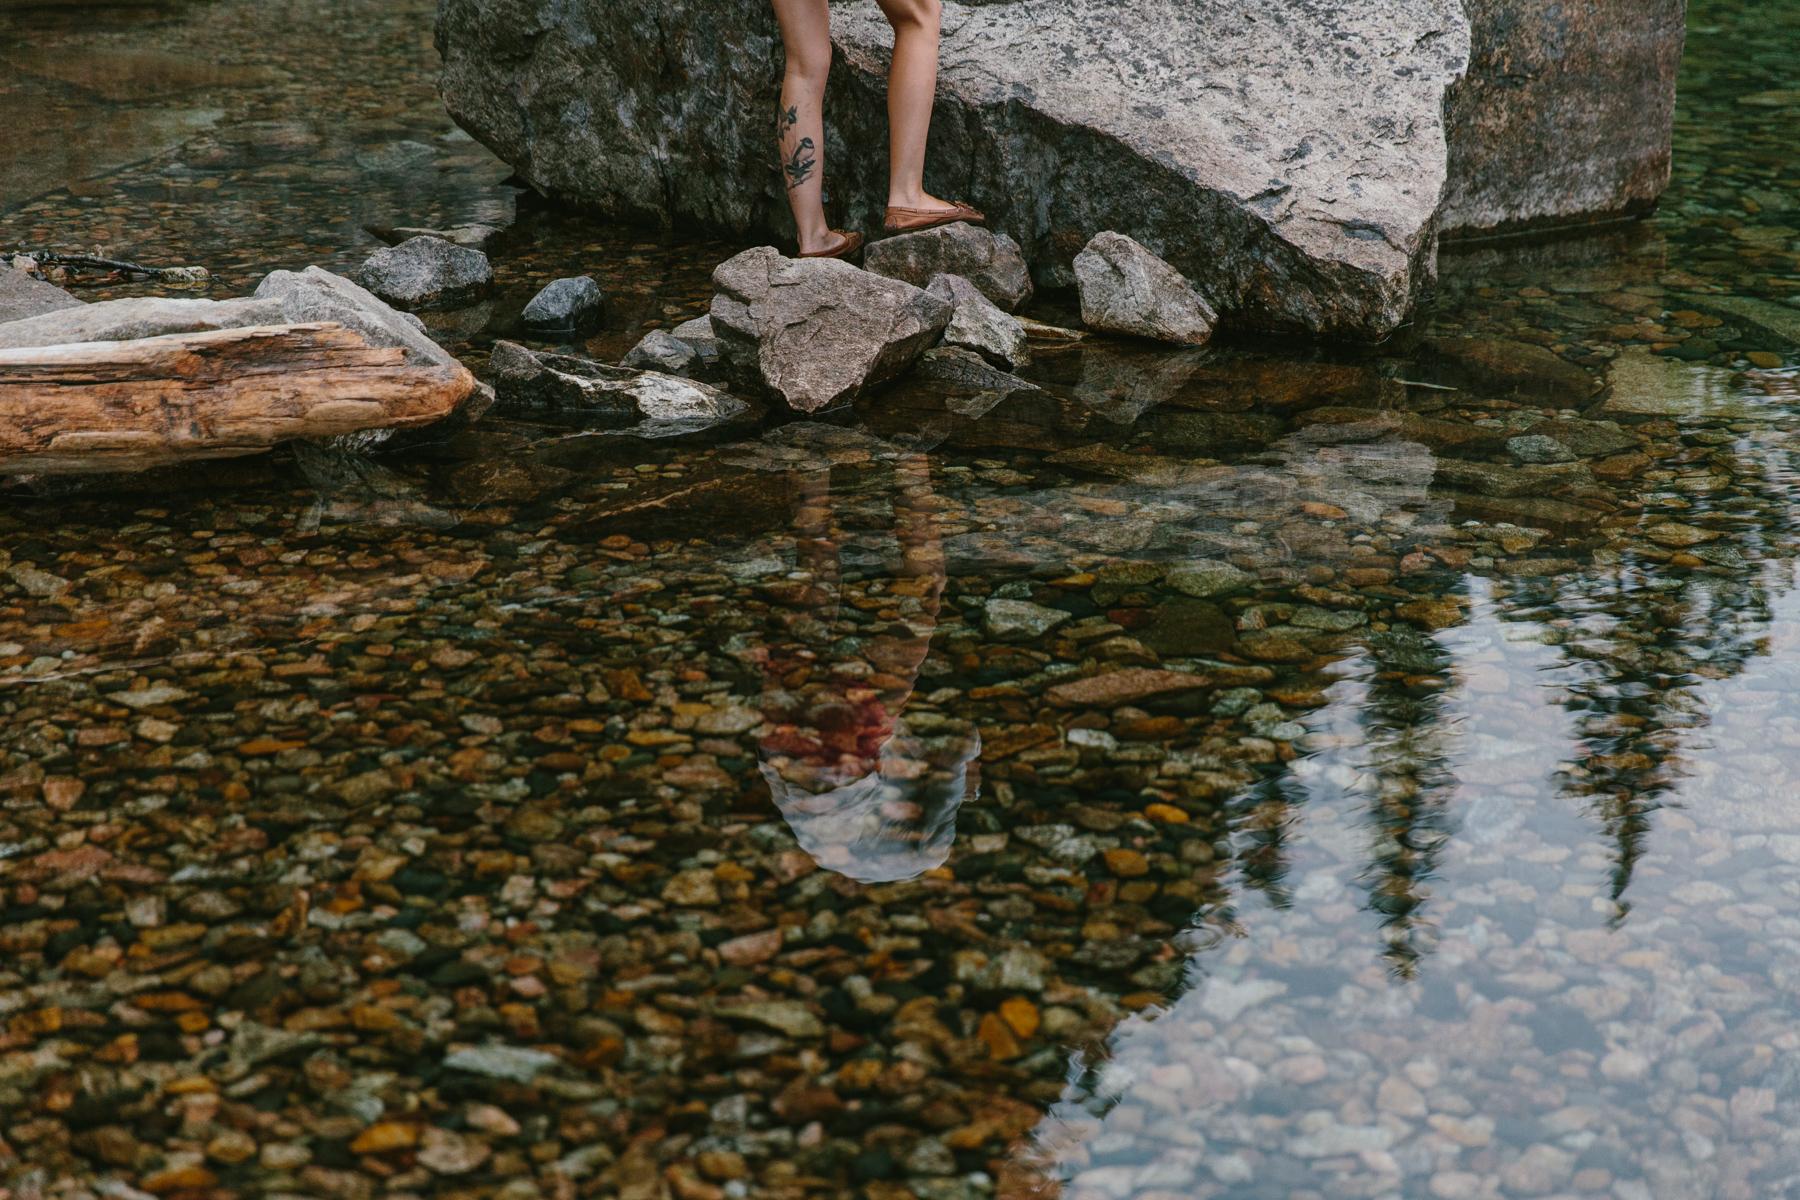 britishcolumbia-canada-lifestyle-photography-mikeseehagel-110